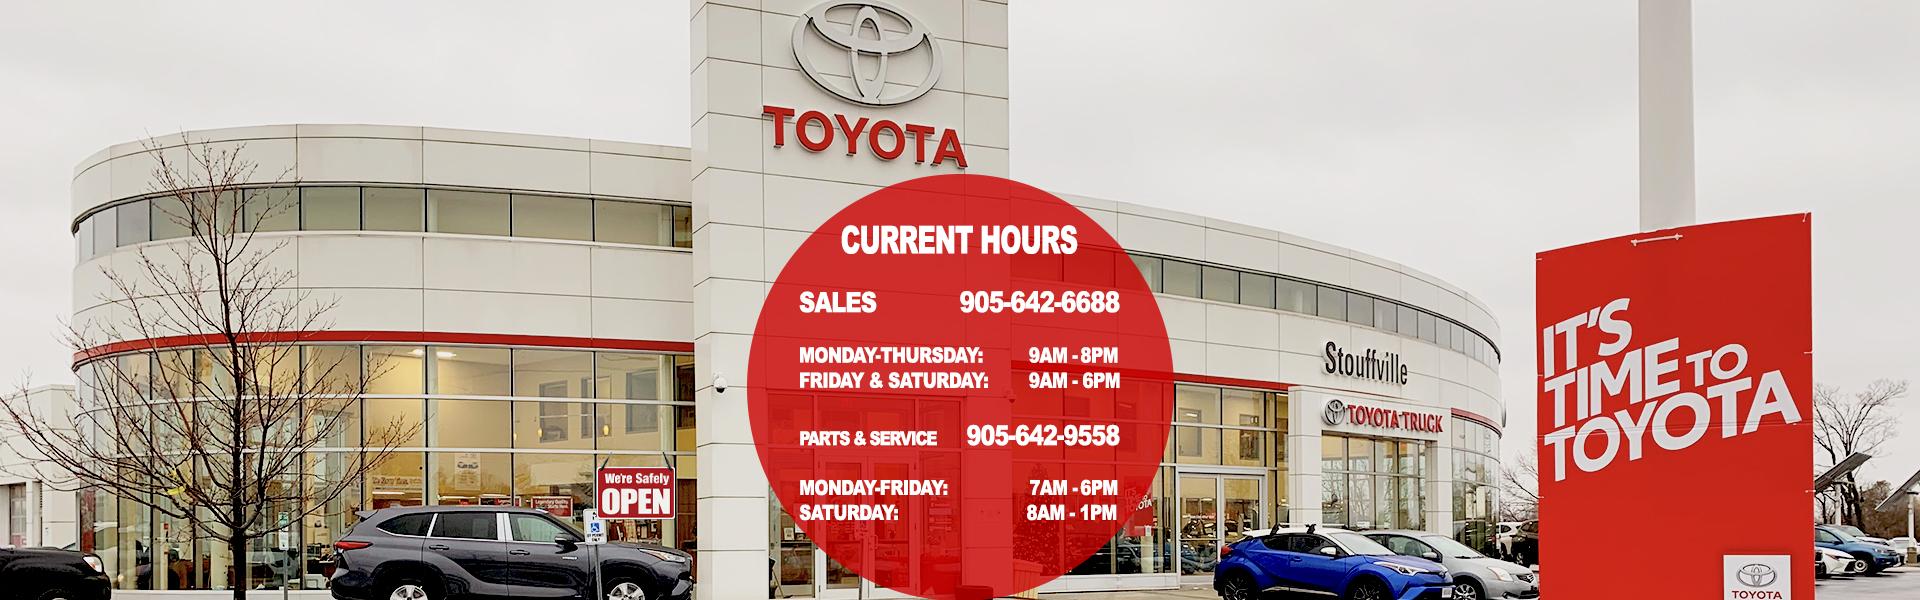 Stouffville Toyota Dealer Hours Update